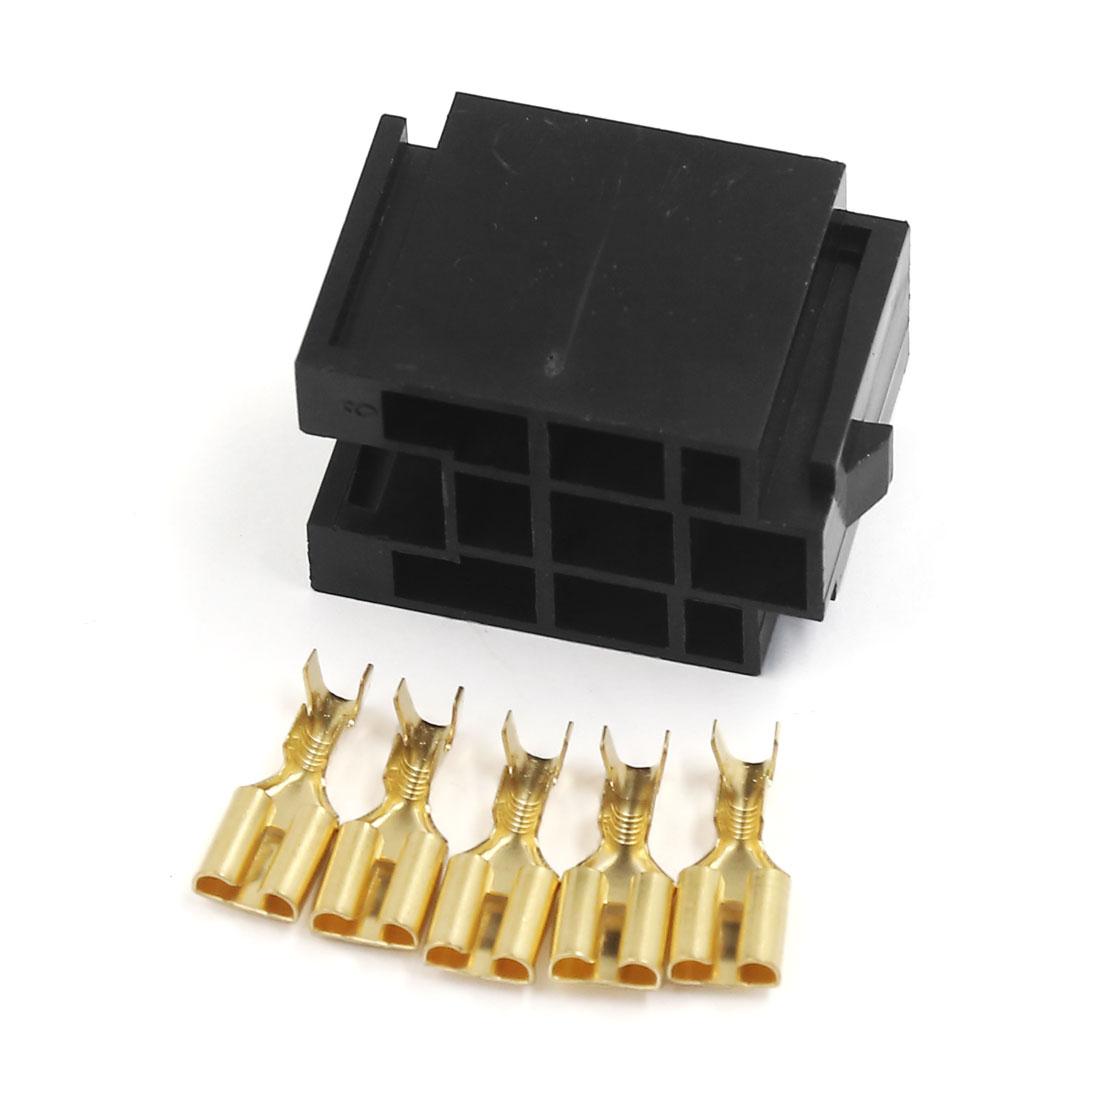 5 Pin Car Truck Relay Socket 12V 30/40Amp 6.3mm Terminal